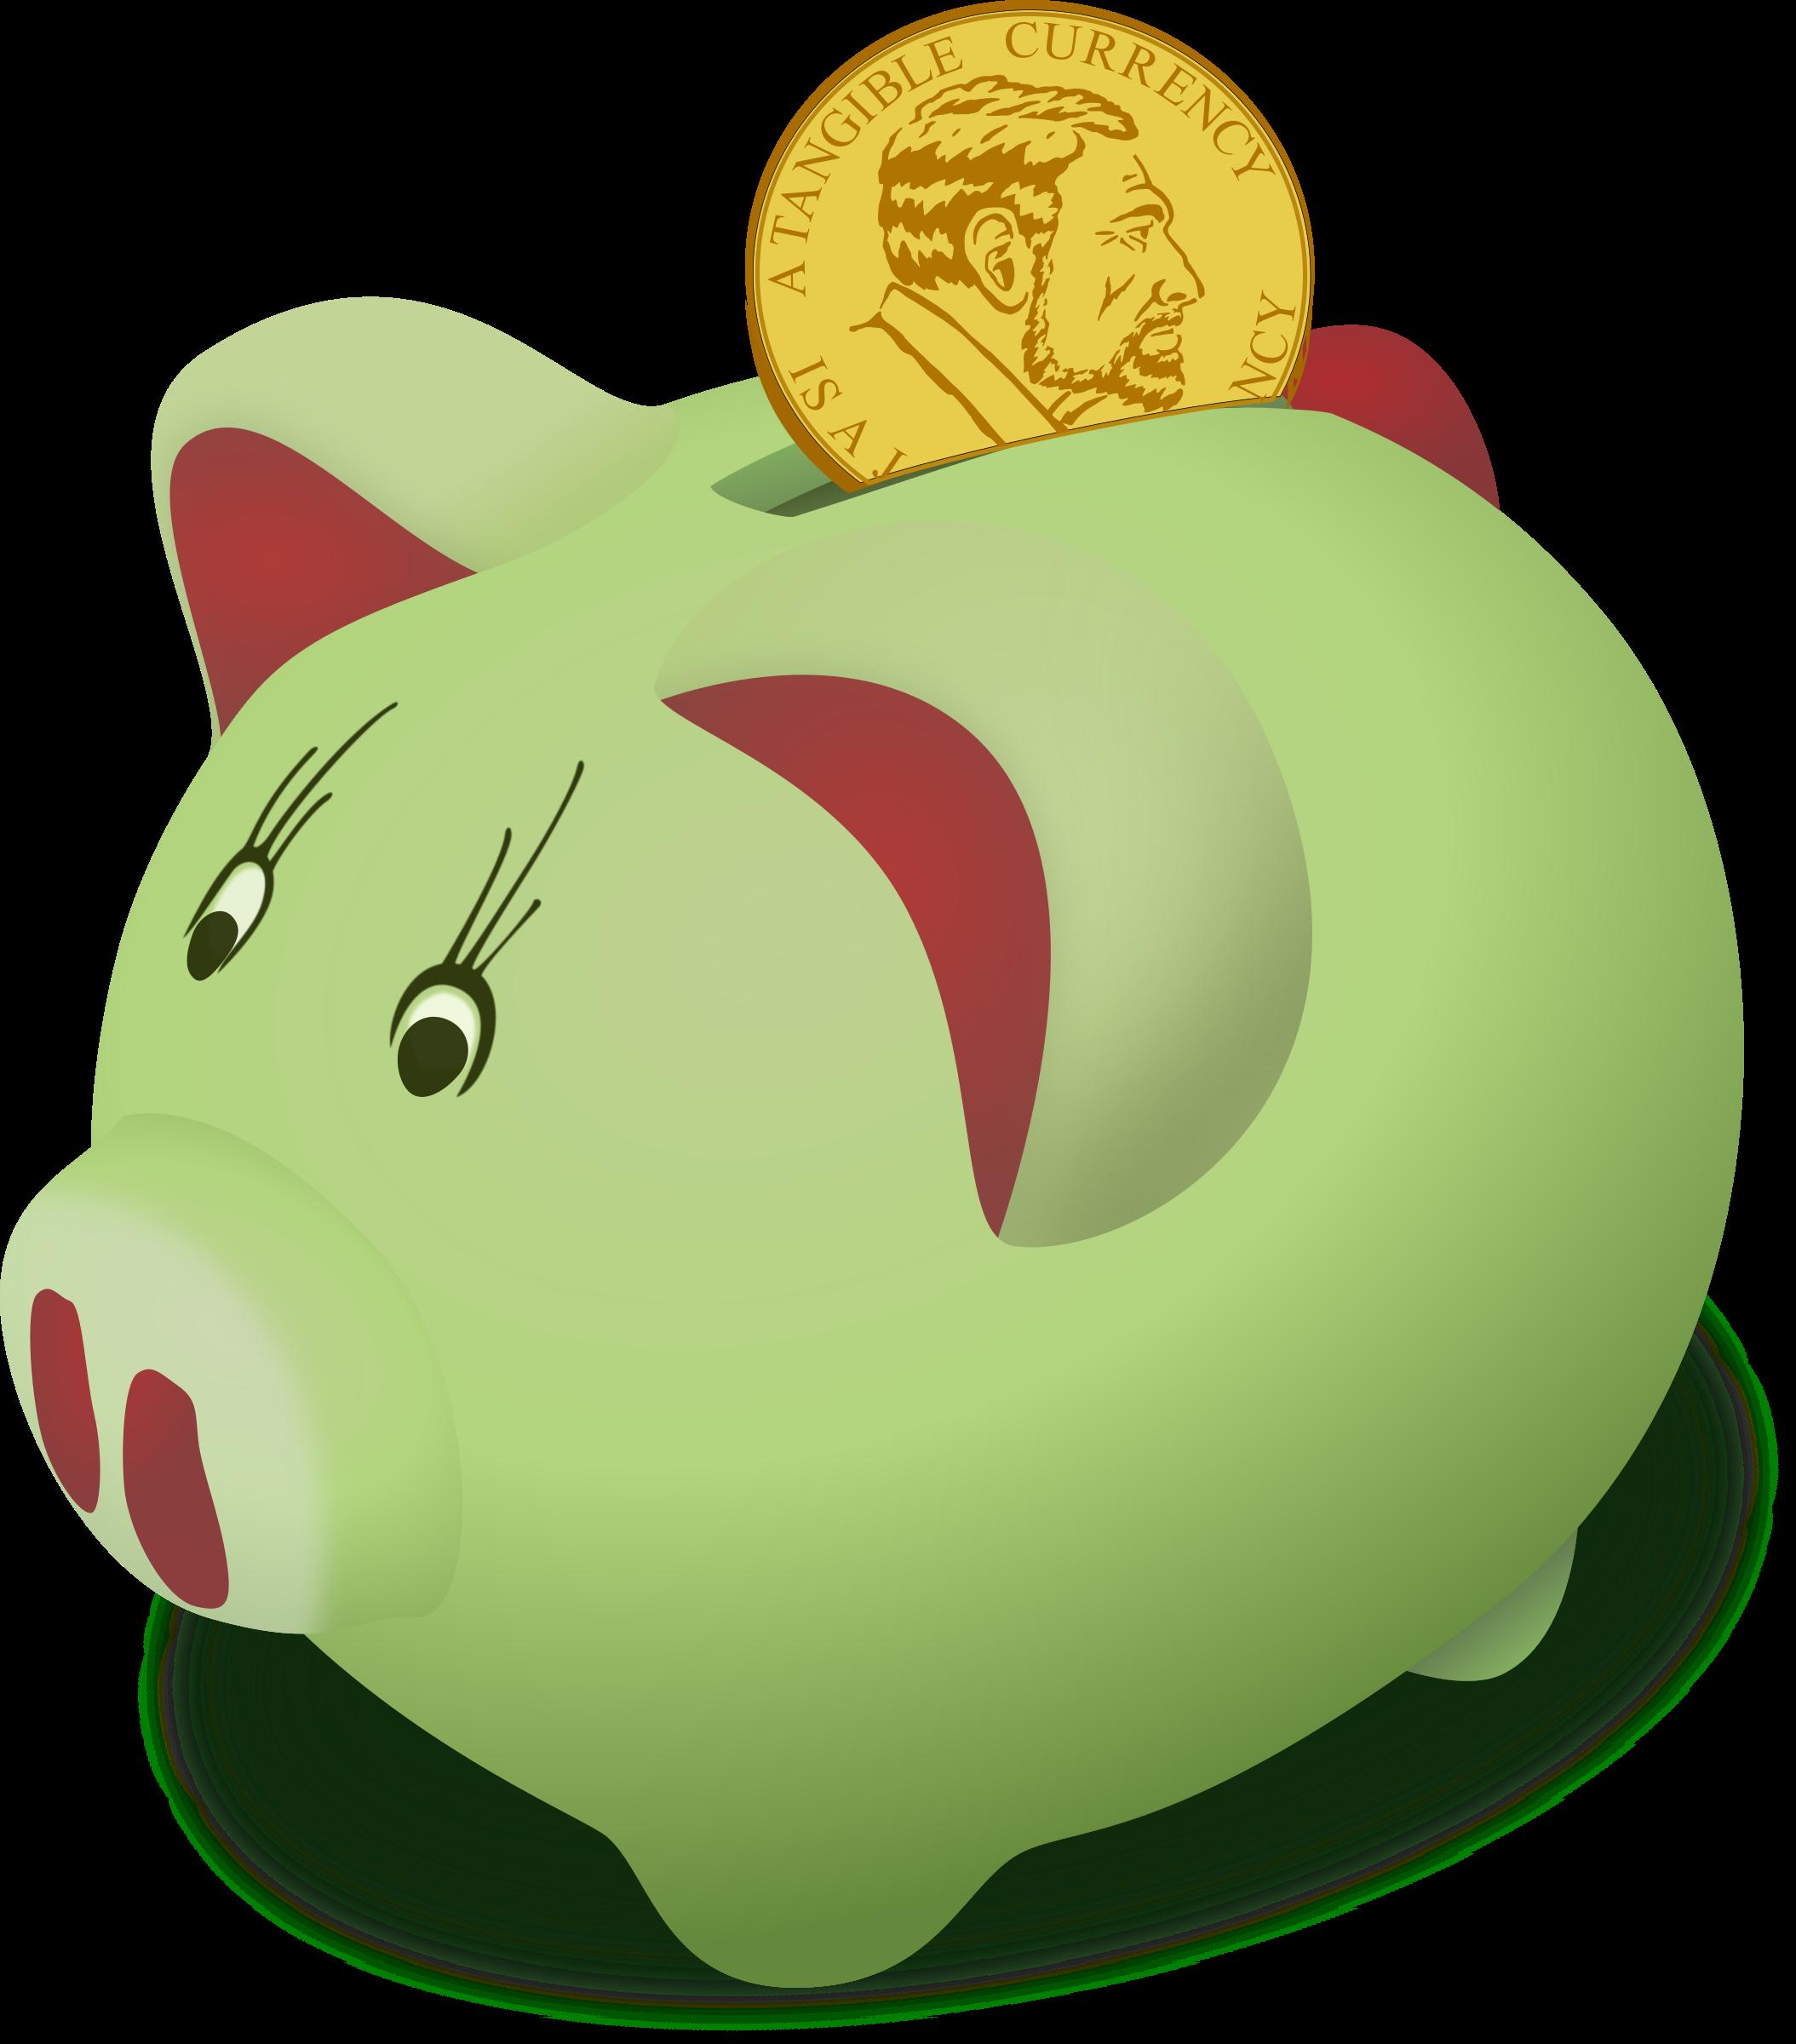 Clipart money finances. Saving up big image